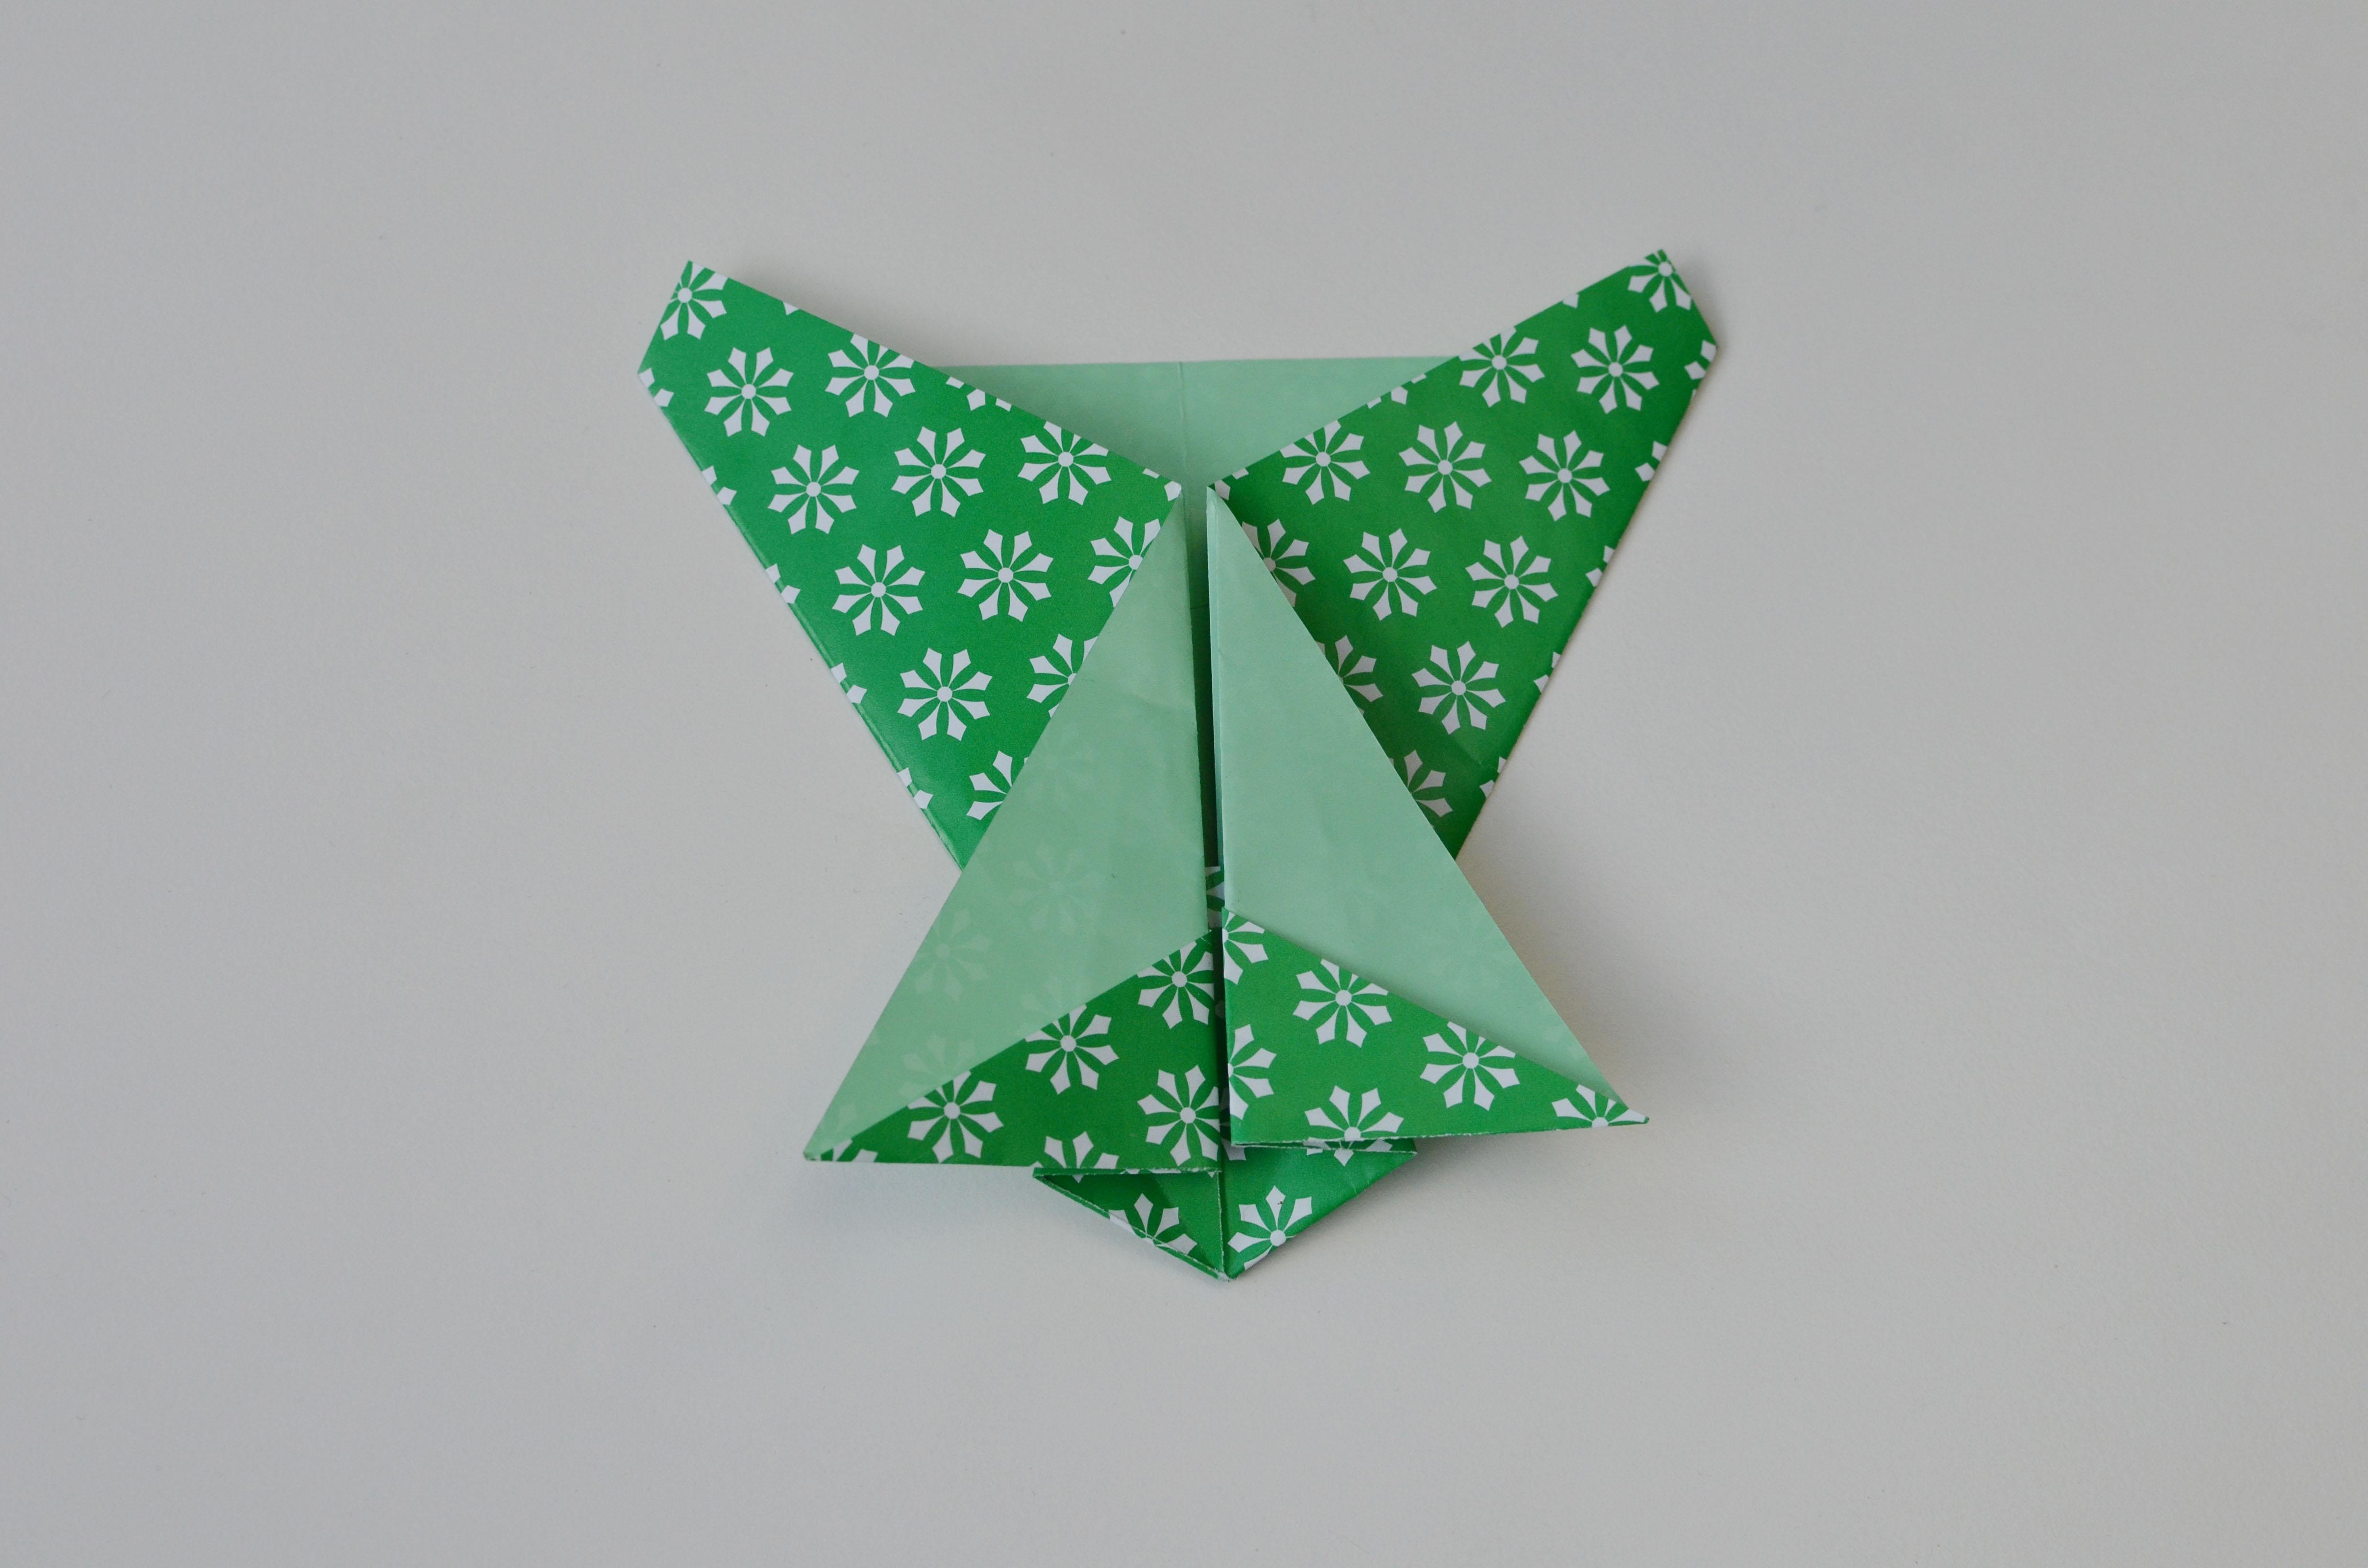 braincrafts_frog_origami_pt26.jpg